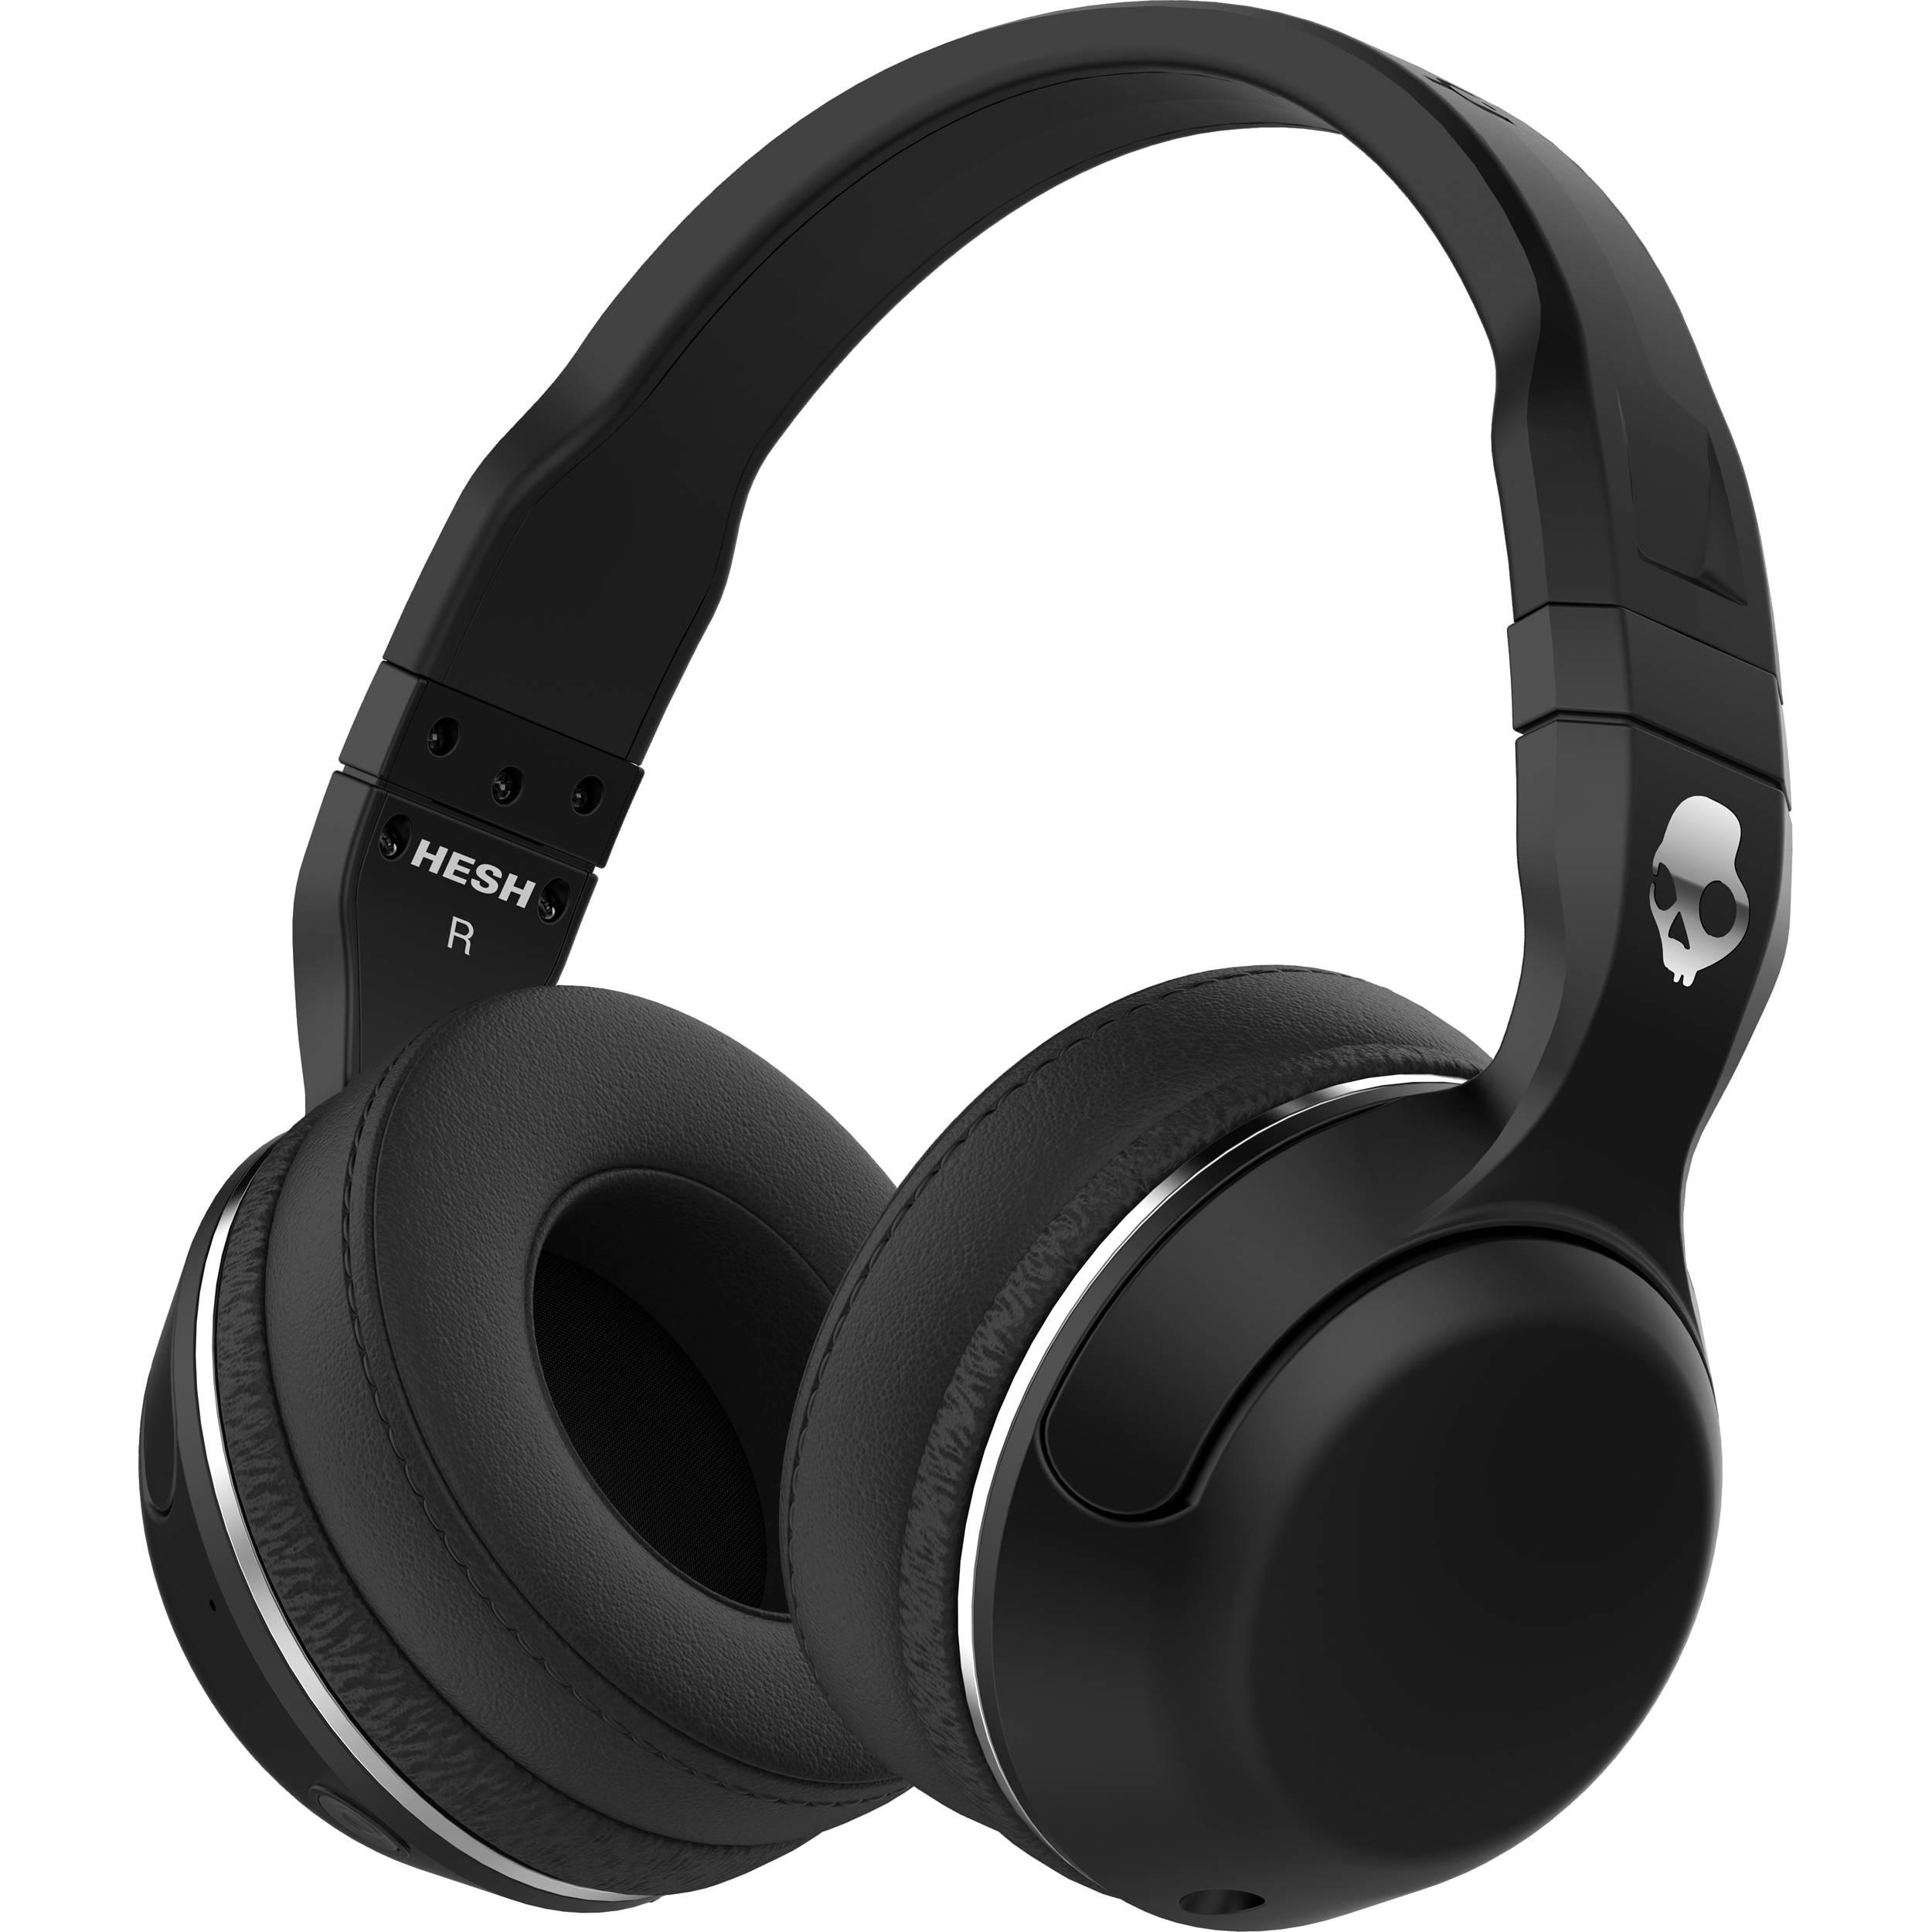 Skullcandy Hesh 2 Wireless Bluetooth Headphones Black